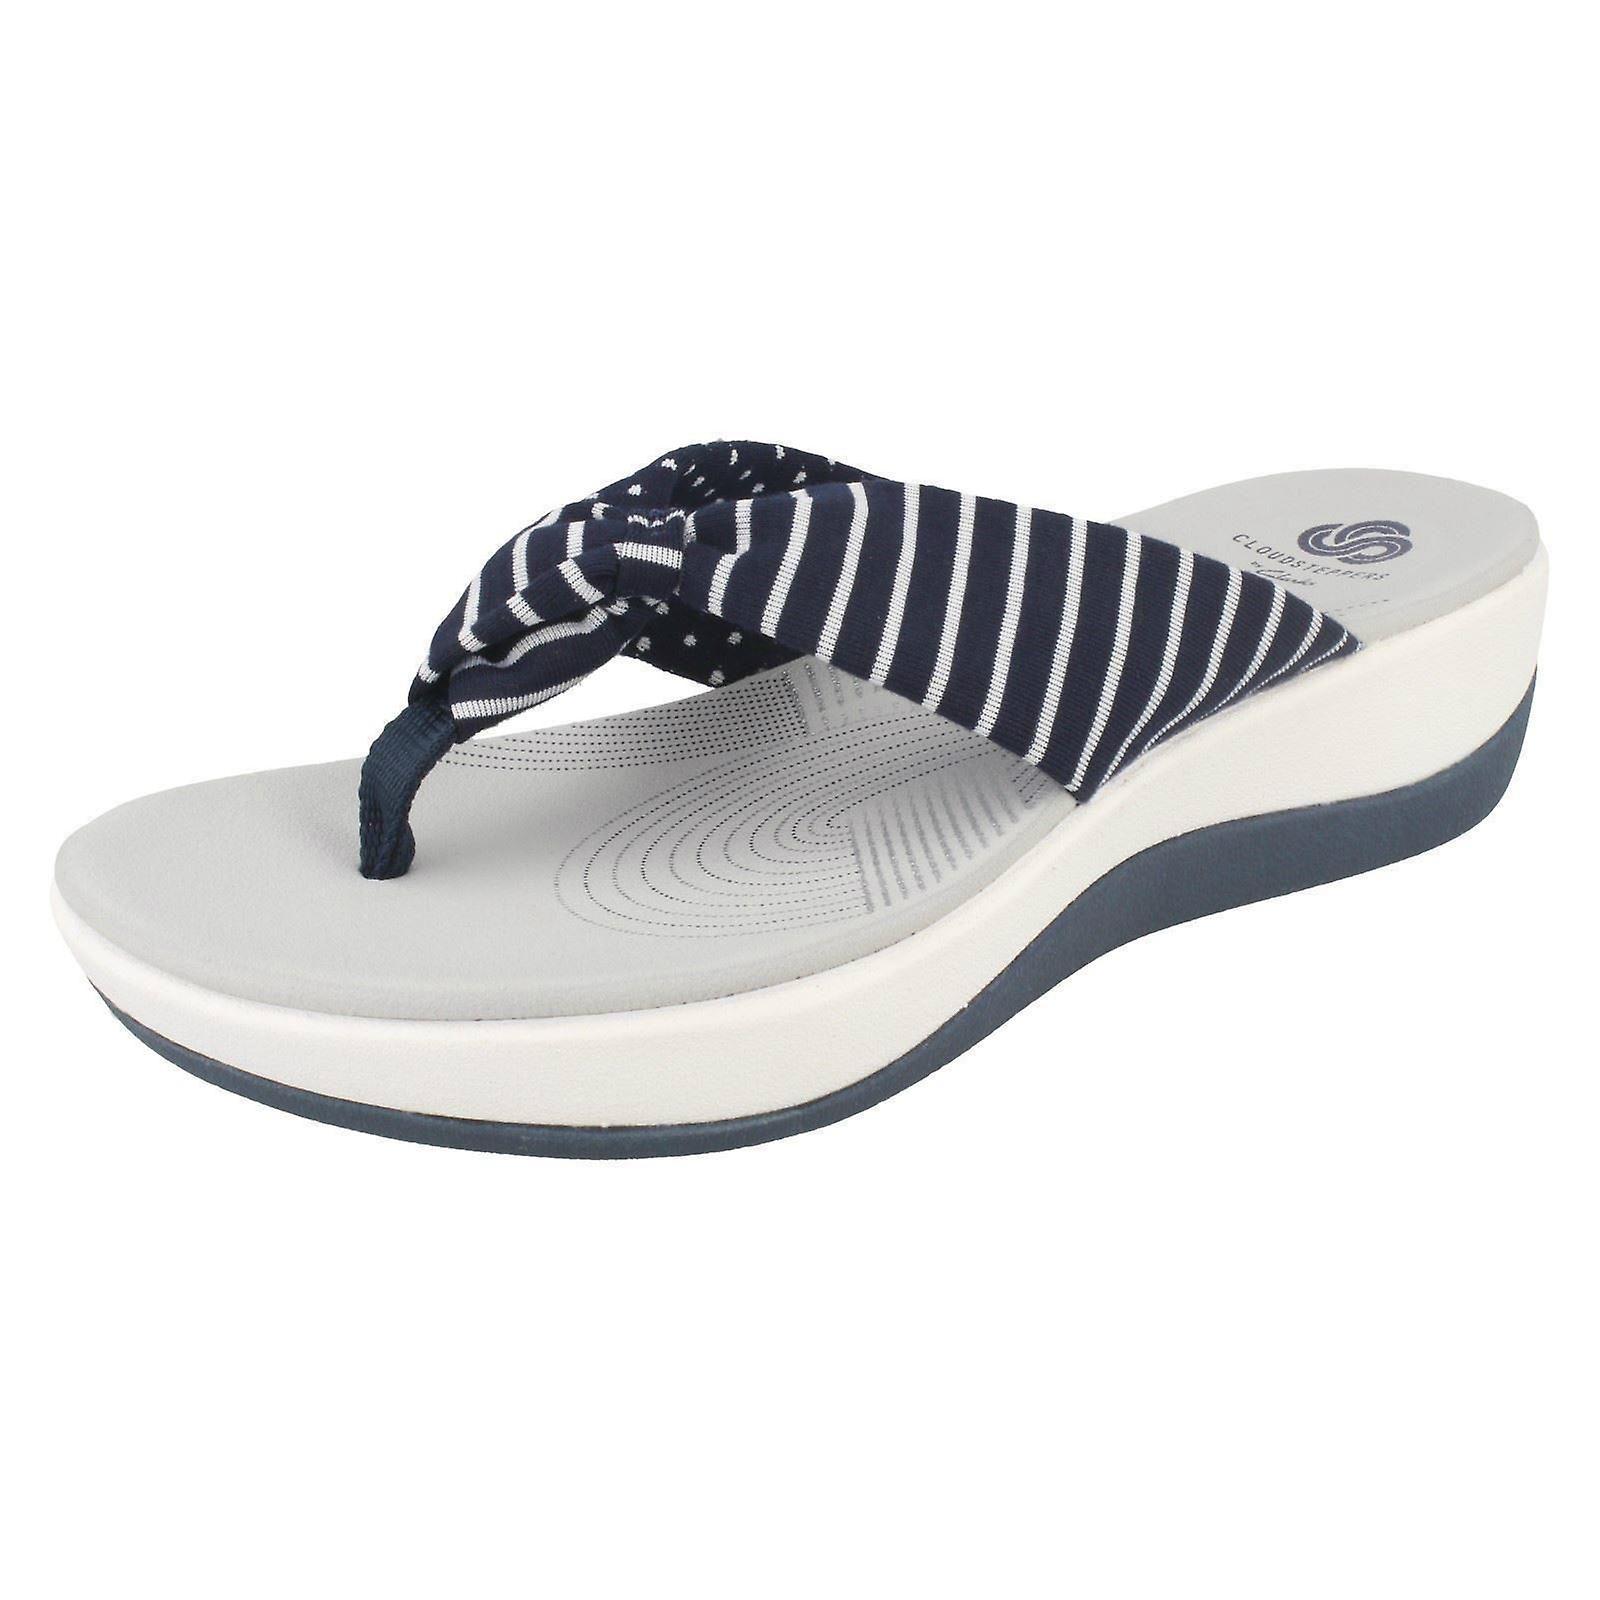 db0b85a9153c Ladies Clarks Cloudsteppers Toe Post Summer Sandals Arla Glison - Navy Combi  Textile - UK